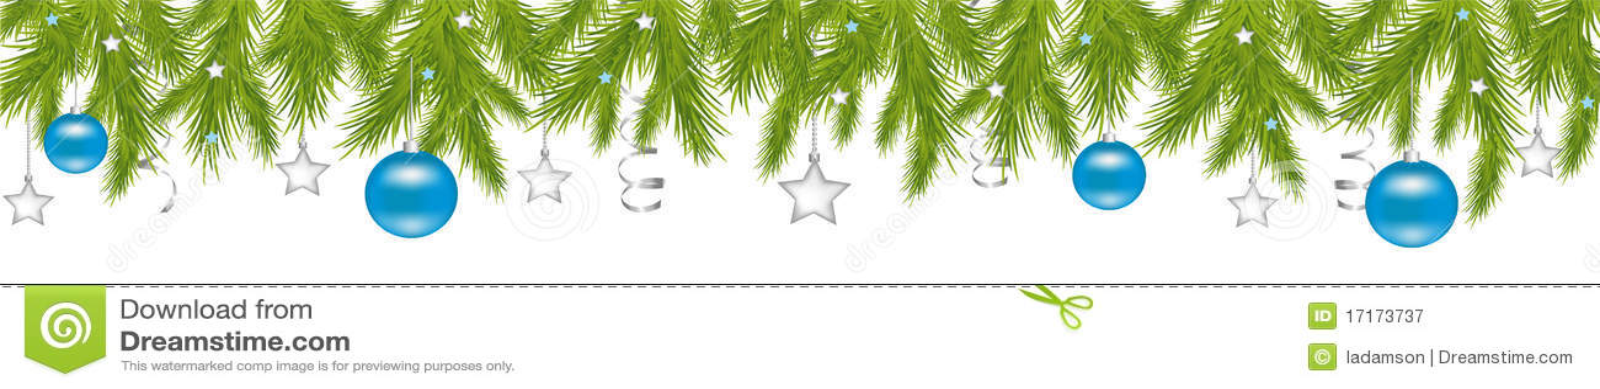 Christmas Header.Merry Christmas Header Vector Stock Vector Illustration